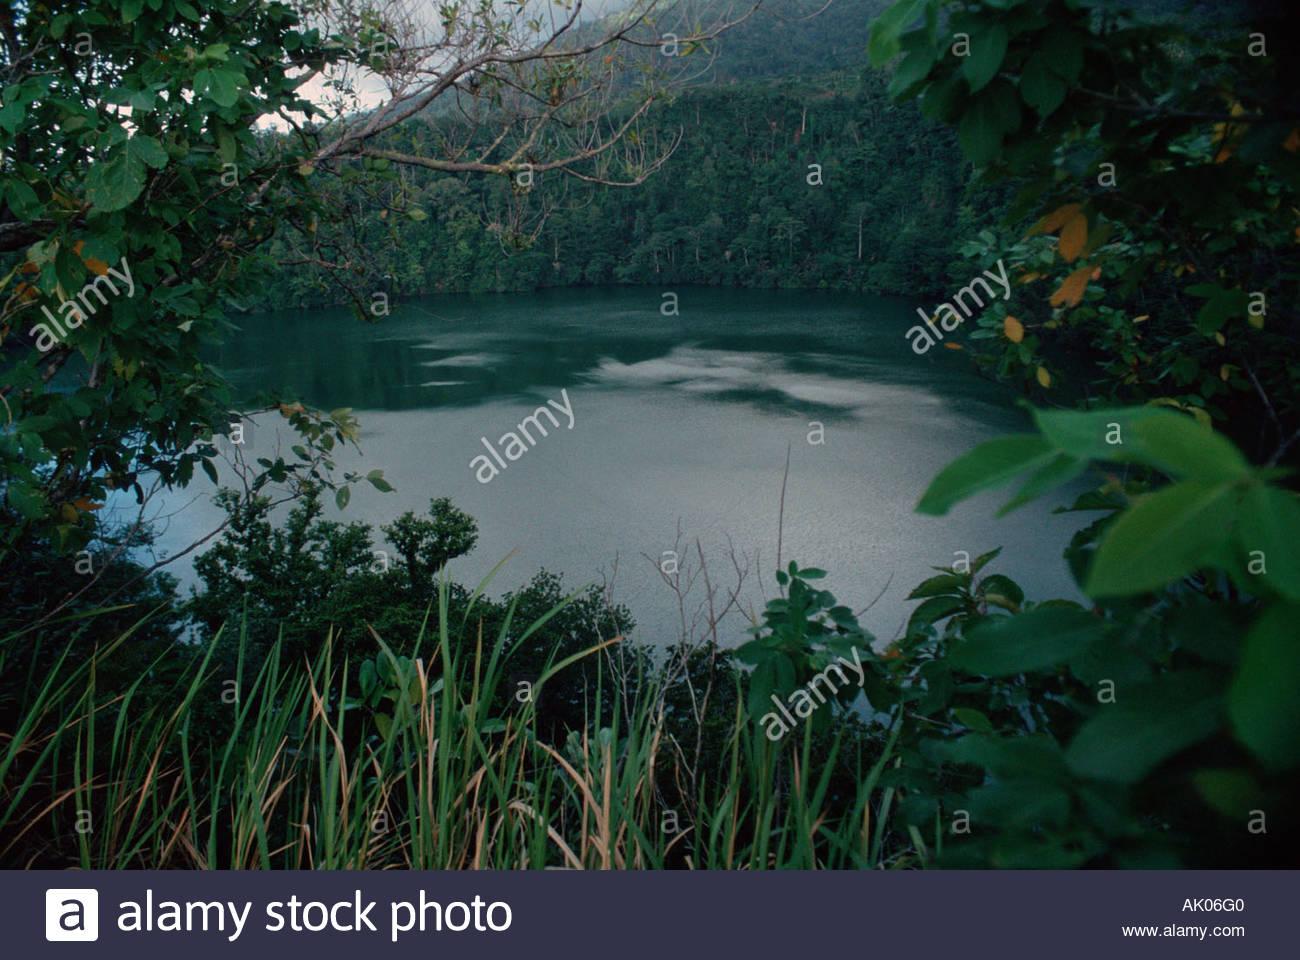 Volcanic lake / Danau Tolire / Krater-See - Stock Image